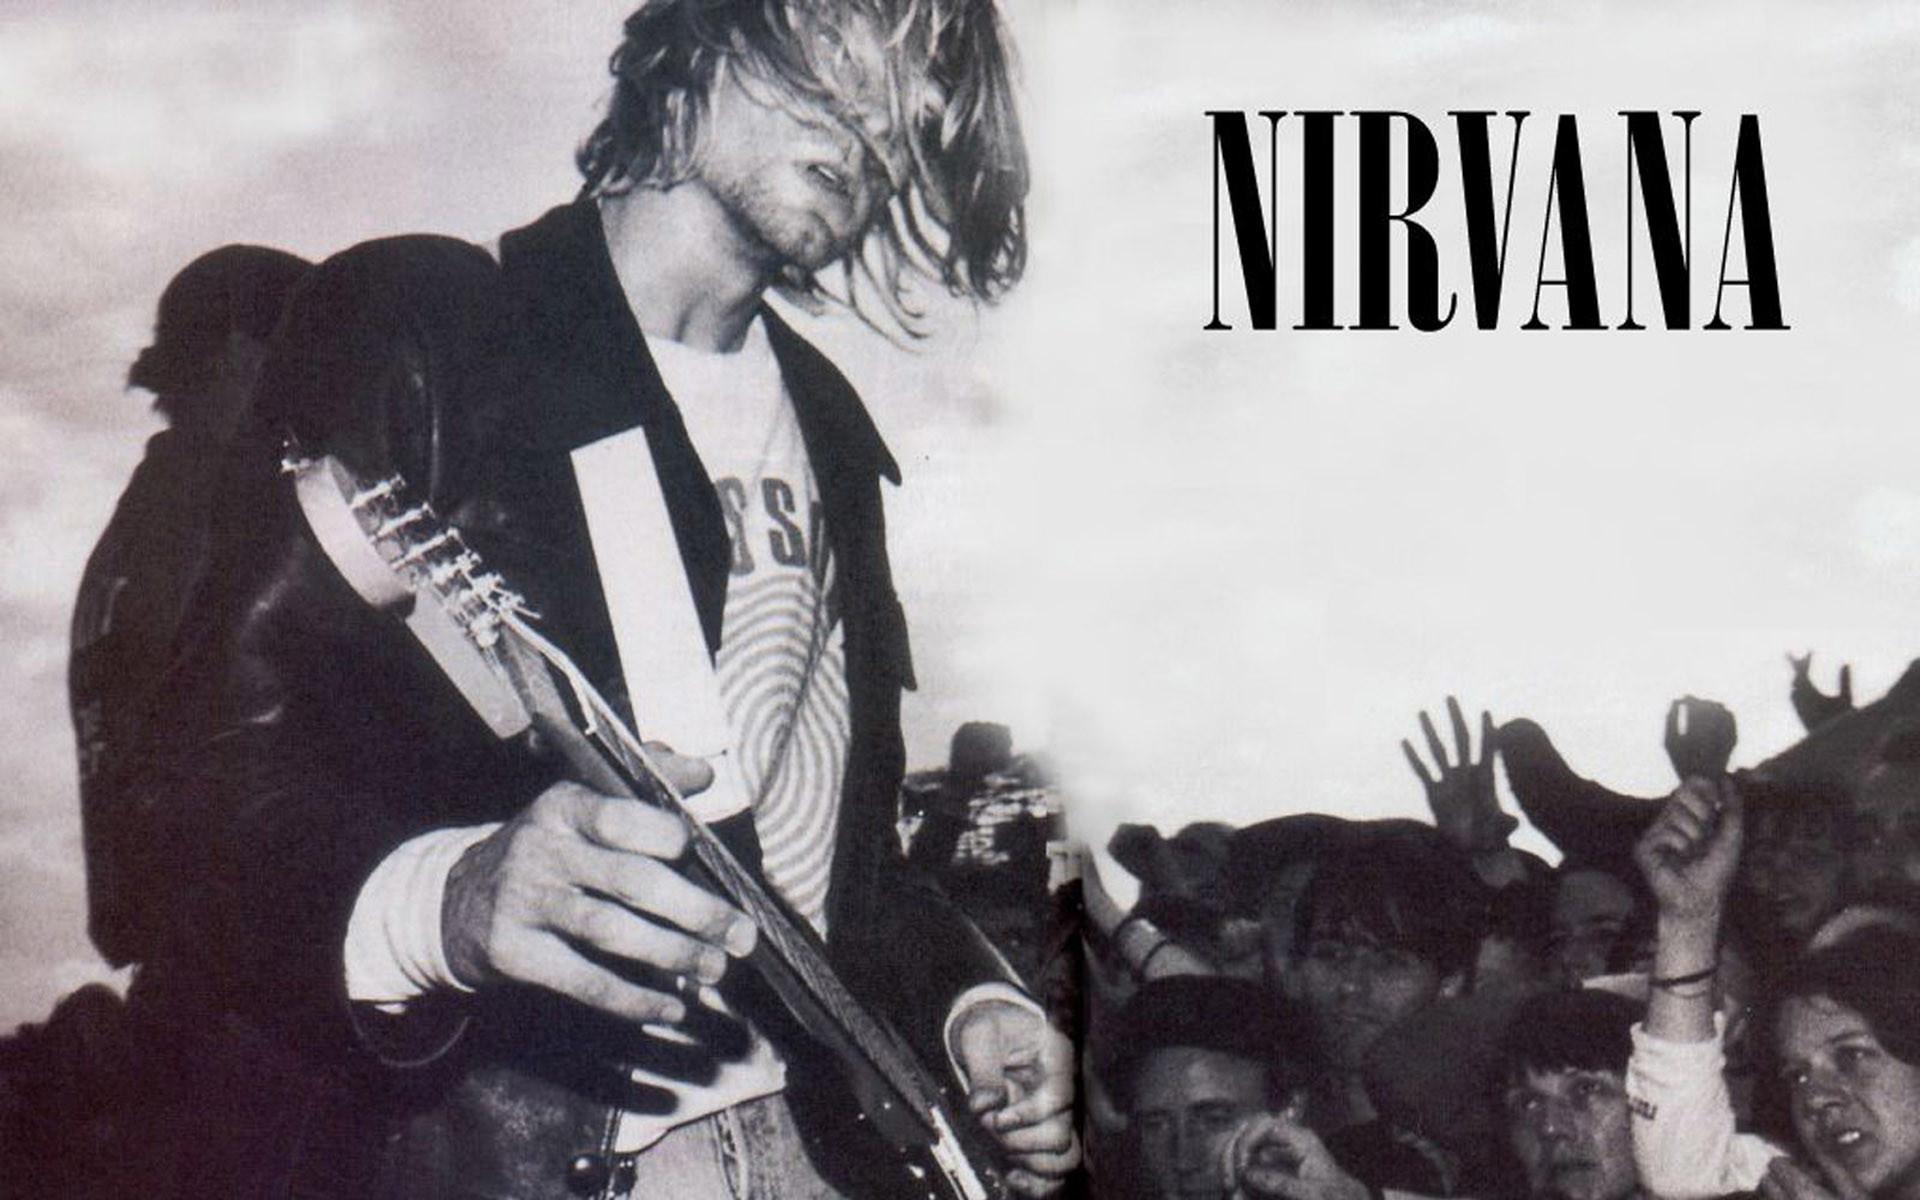 Fonds d?cran Nirvana : tous les wallpapers Nirvana